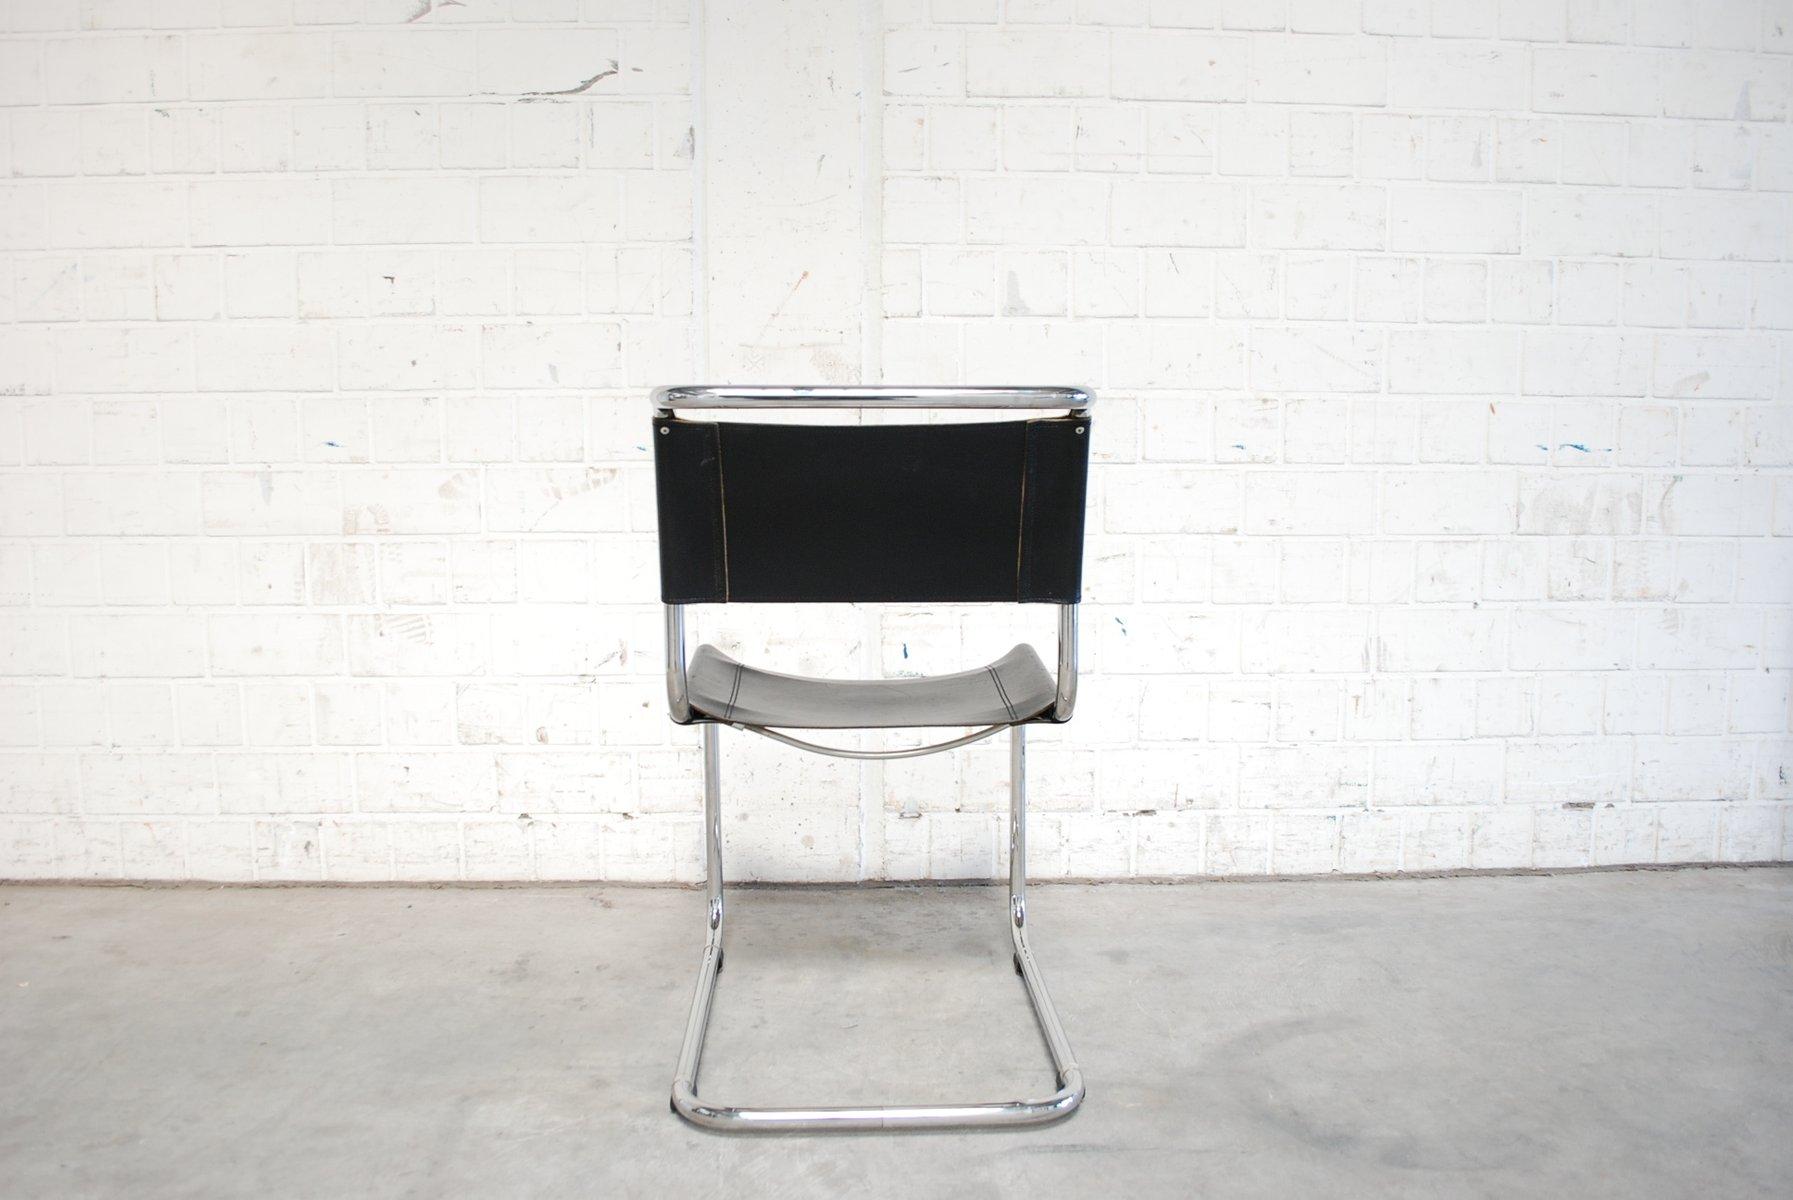 vintage s33 chairs by mart stam for thonet set of 2 for. Black Bedroom Furniture Sets. Home Design Ideas